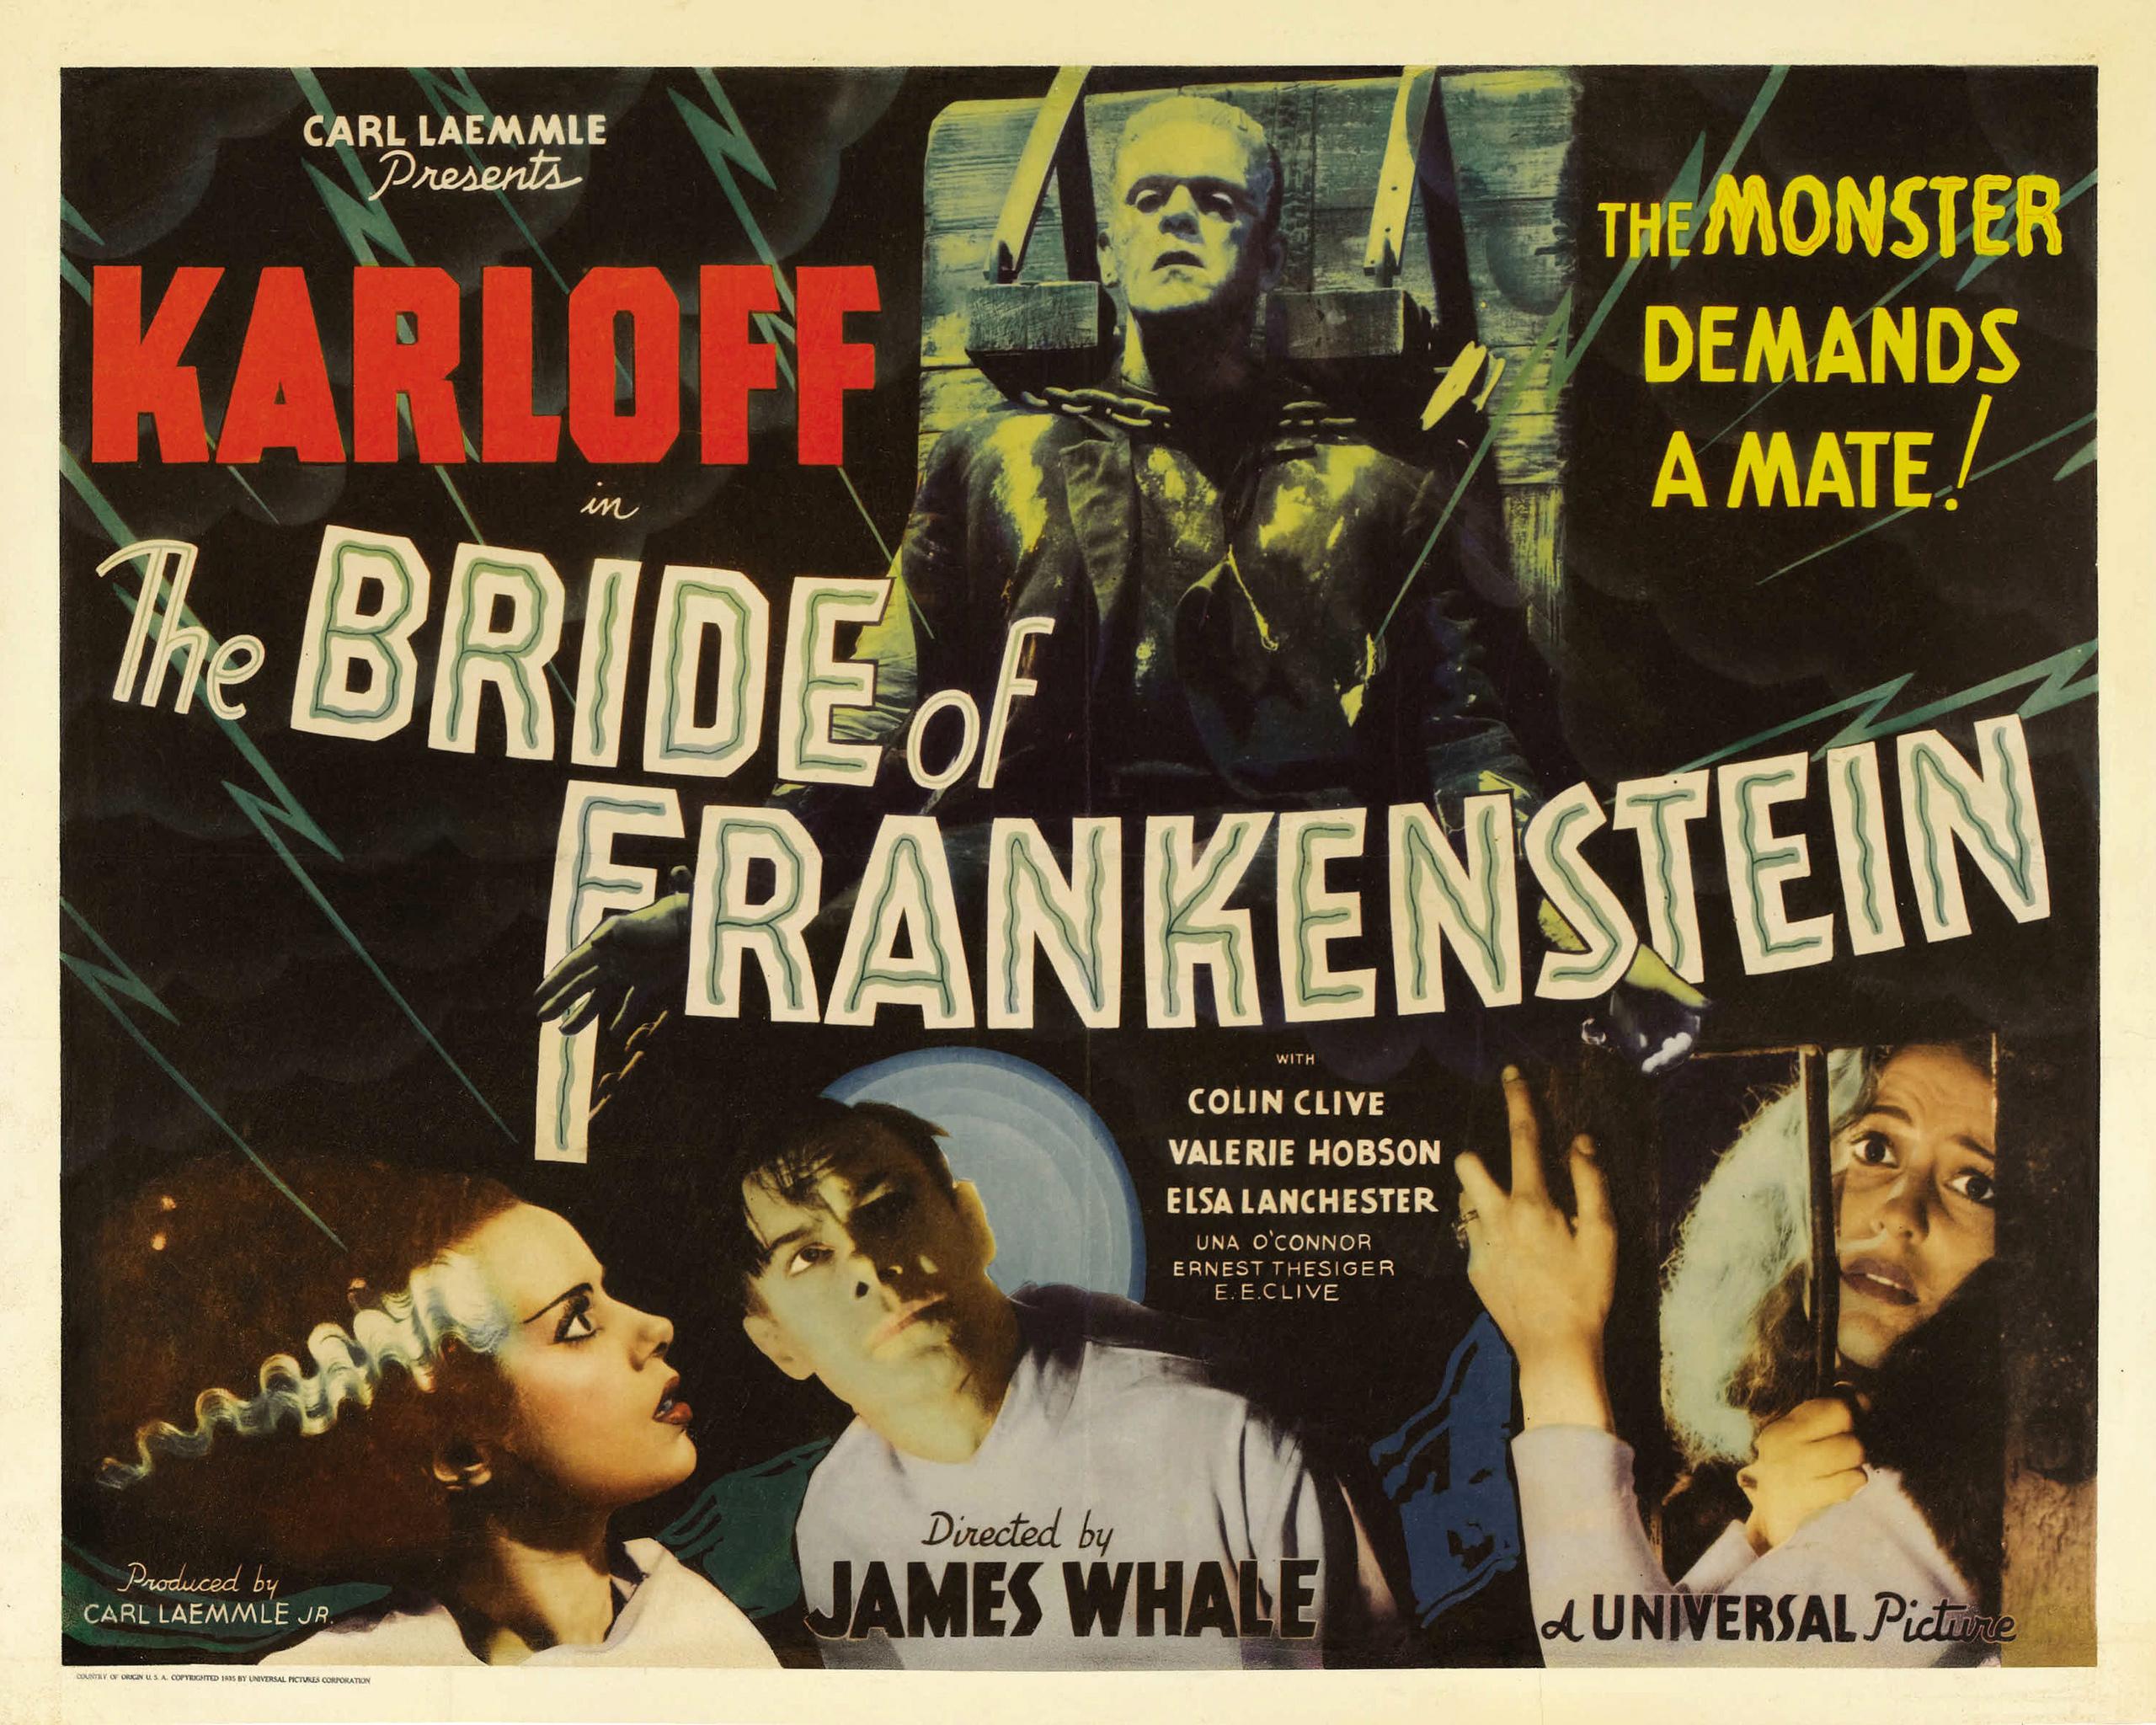 bride of frankenstein images poster art hd wallpaper and